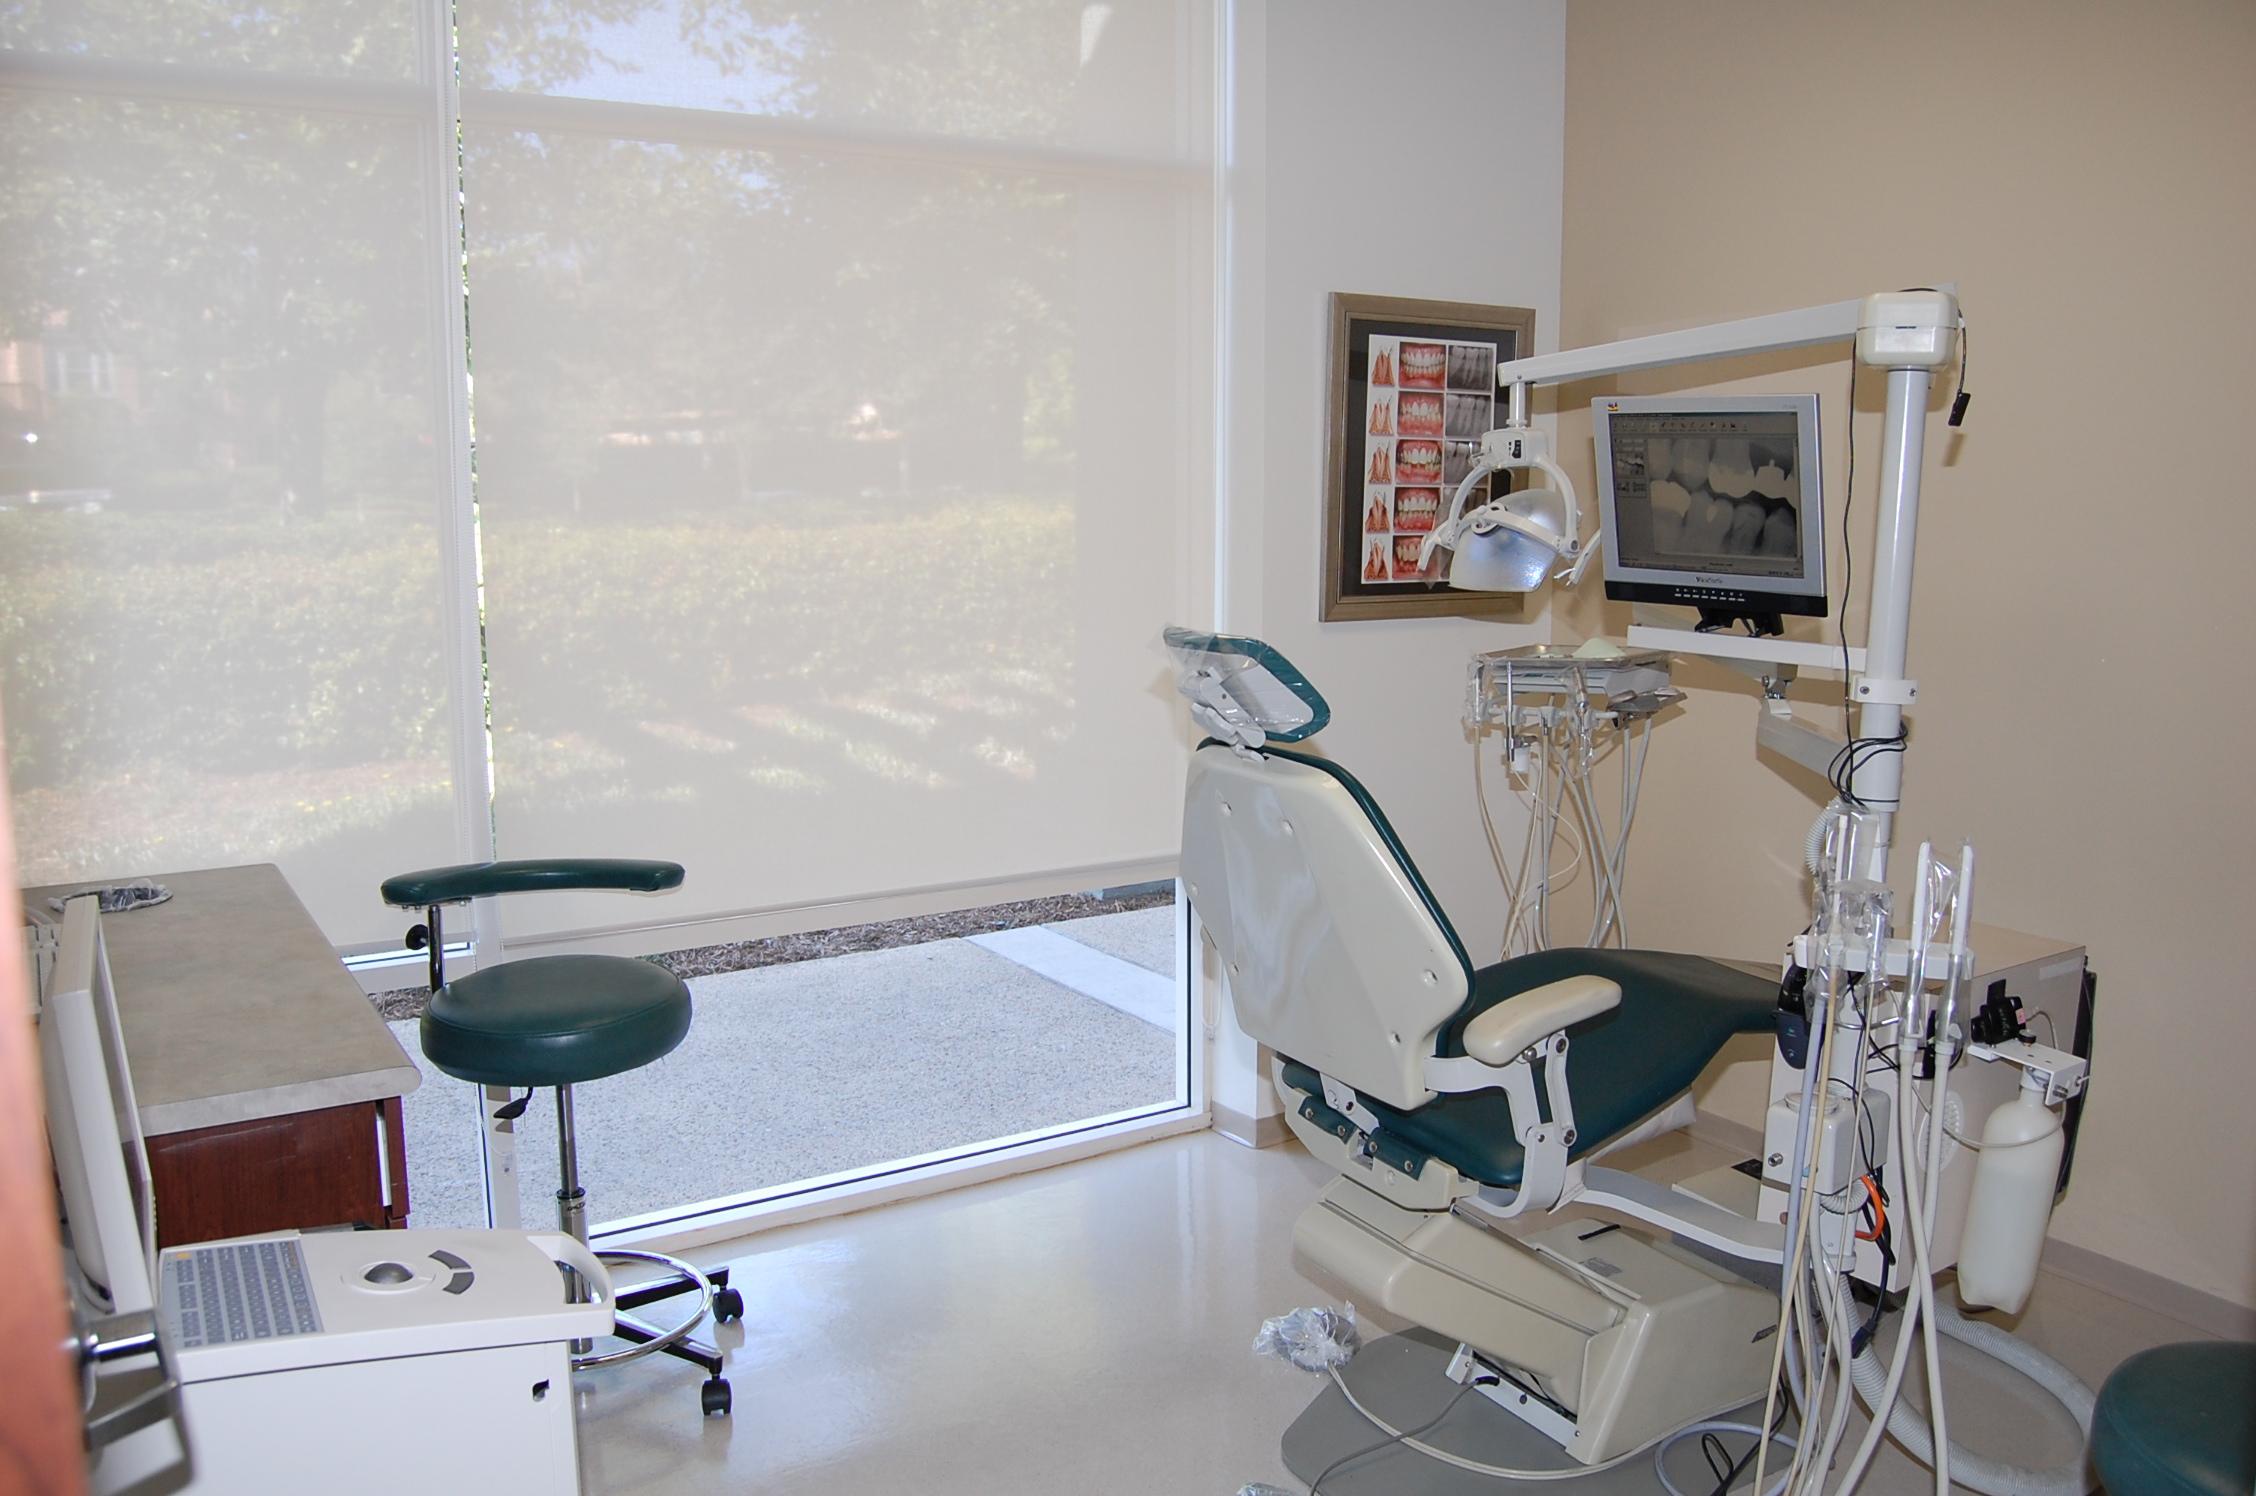 Rancho Dental Group and Orthodontics image 4